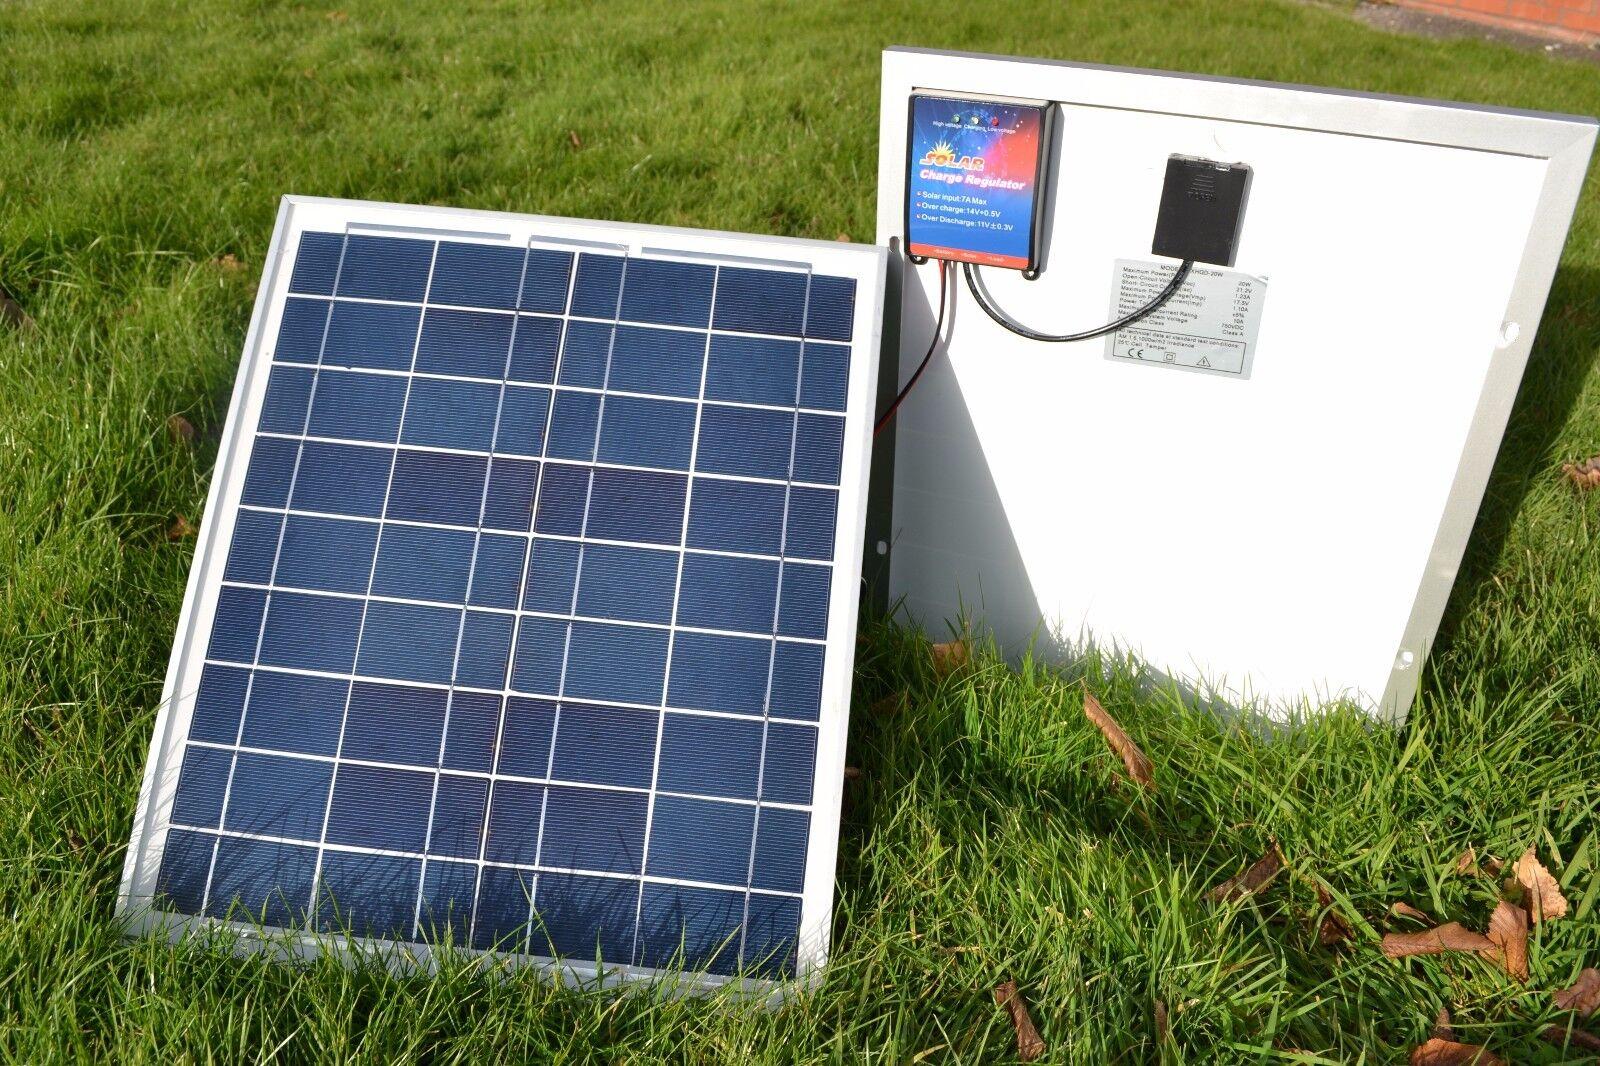 20 - Watt Solar Panel for Microcat & Technicat Bait Boat Batteries 12v